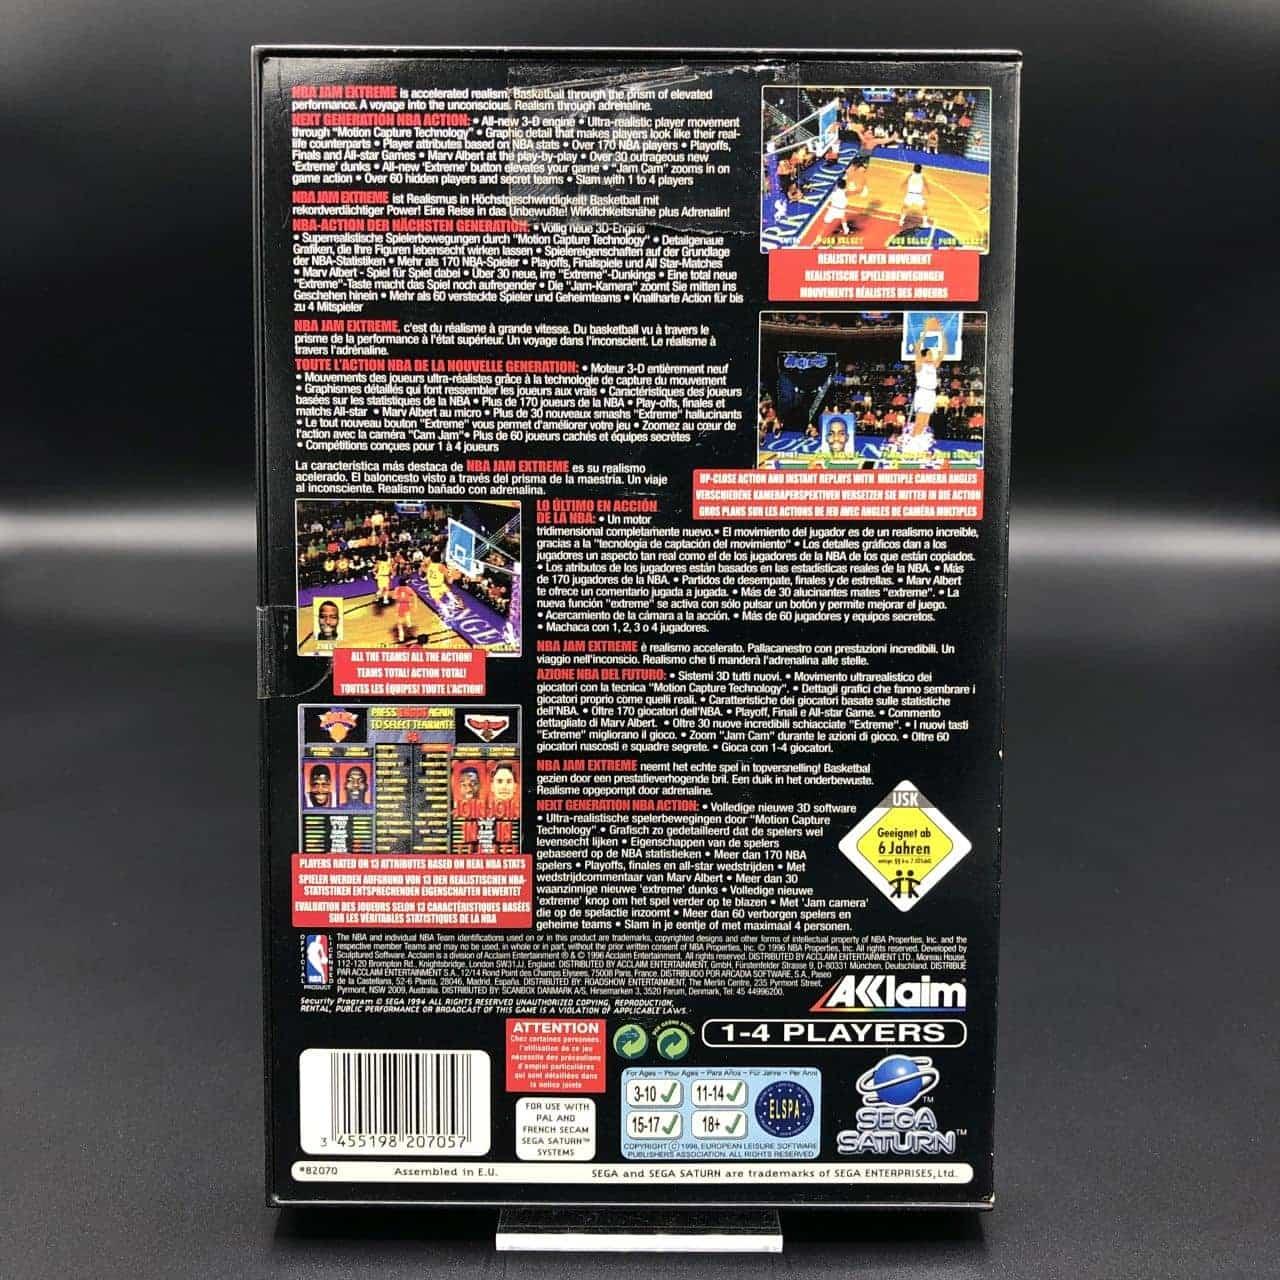 NBA Jam Extreme (Komplett) (Sehr gut) Sega Saturn